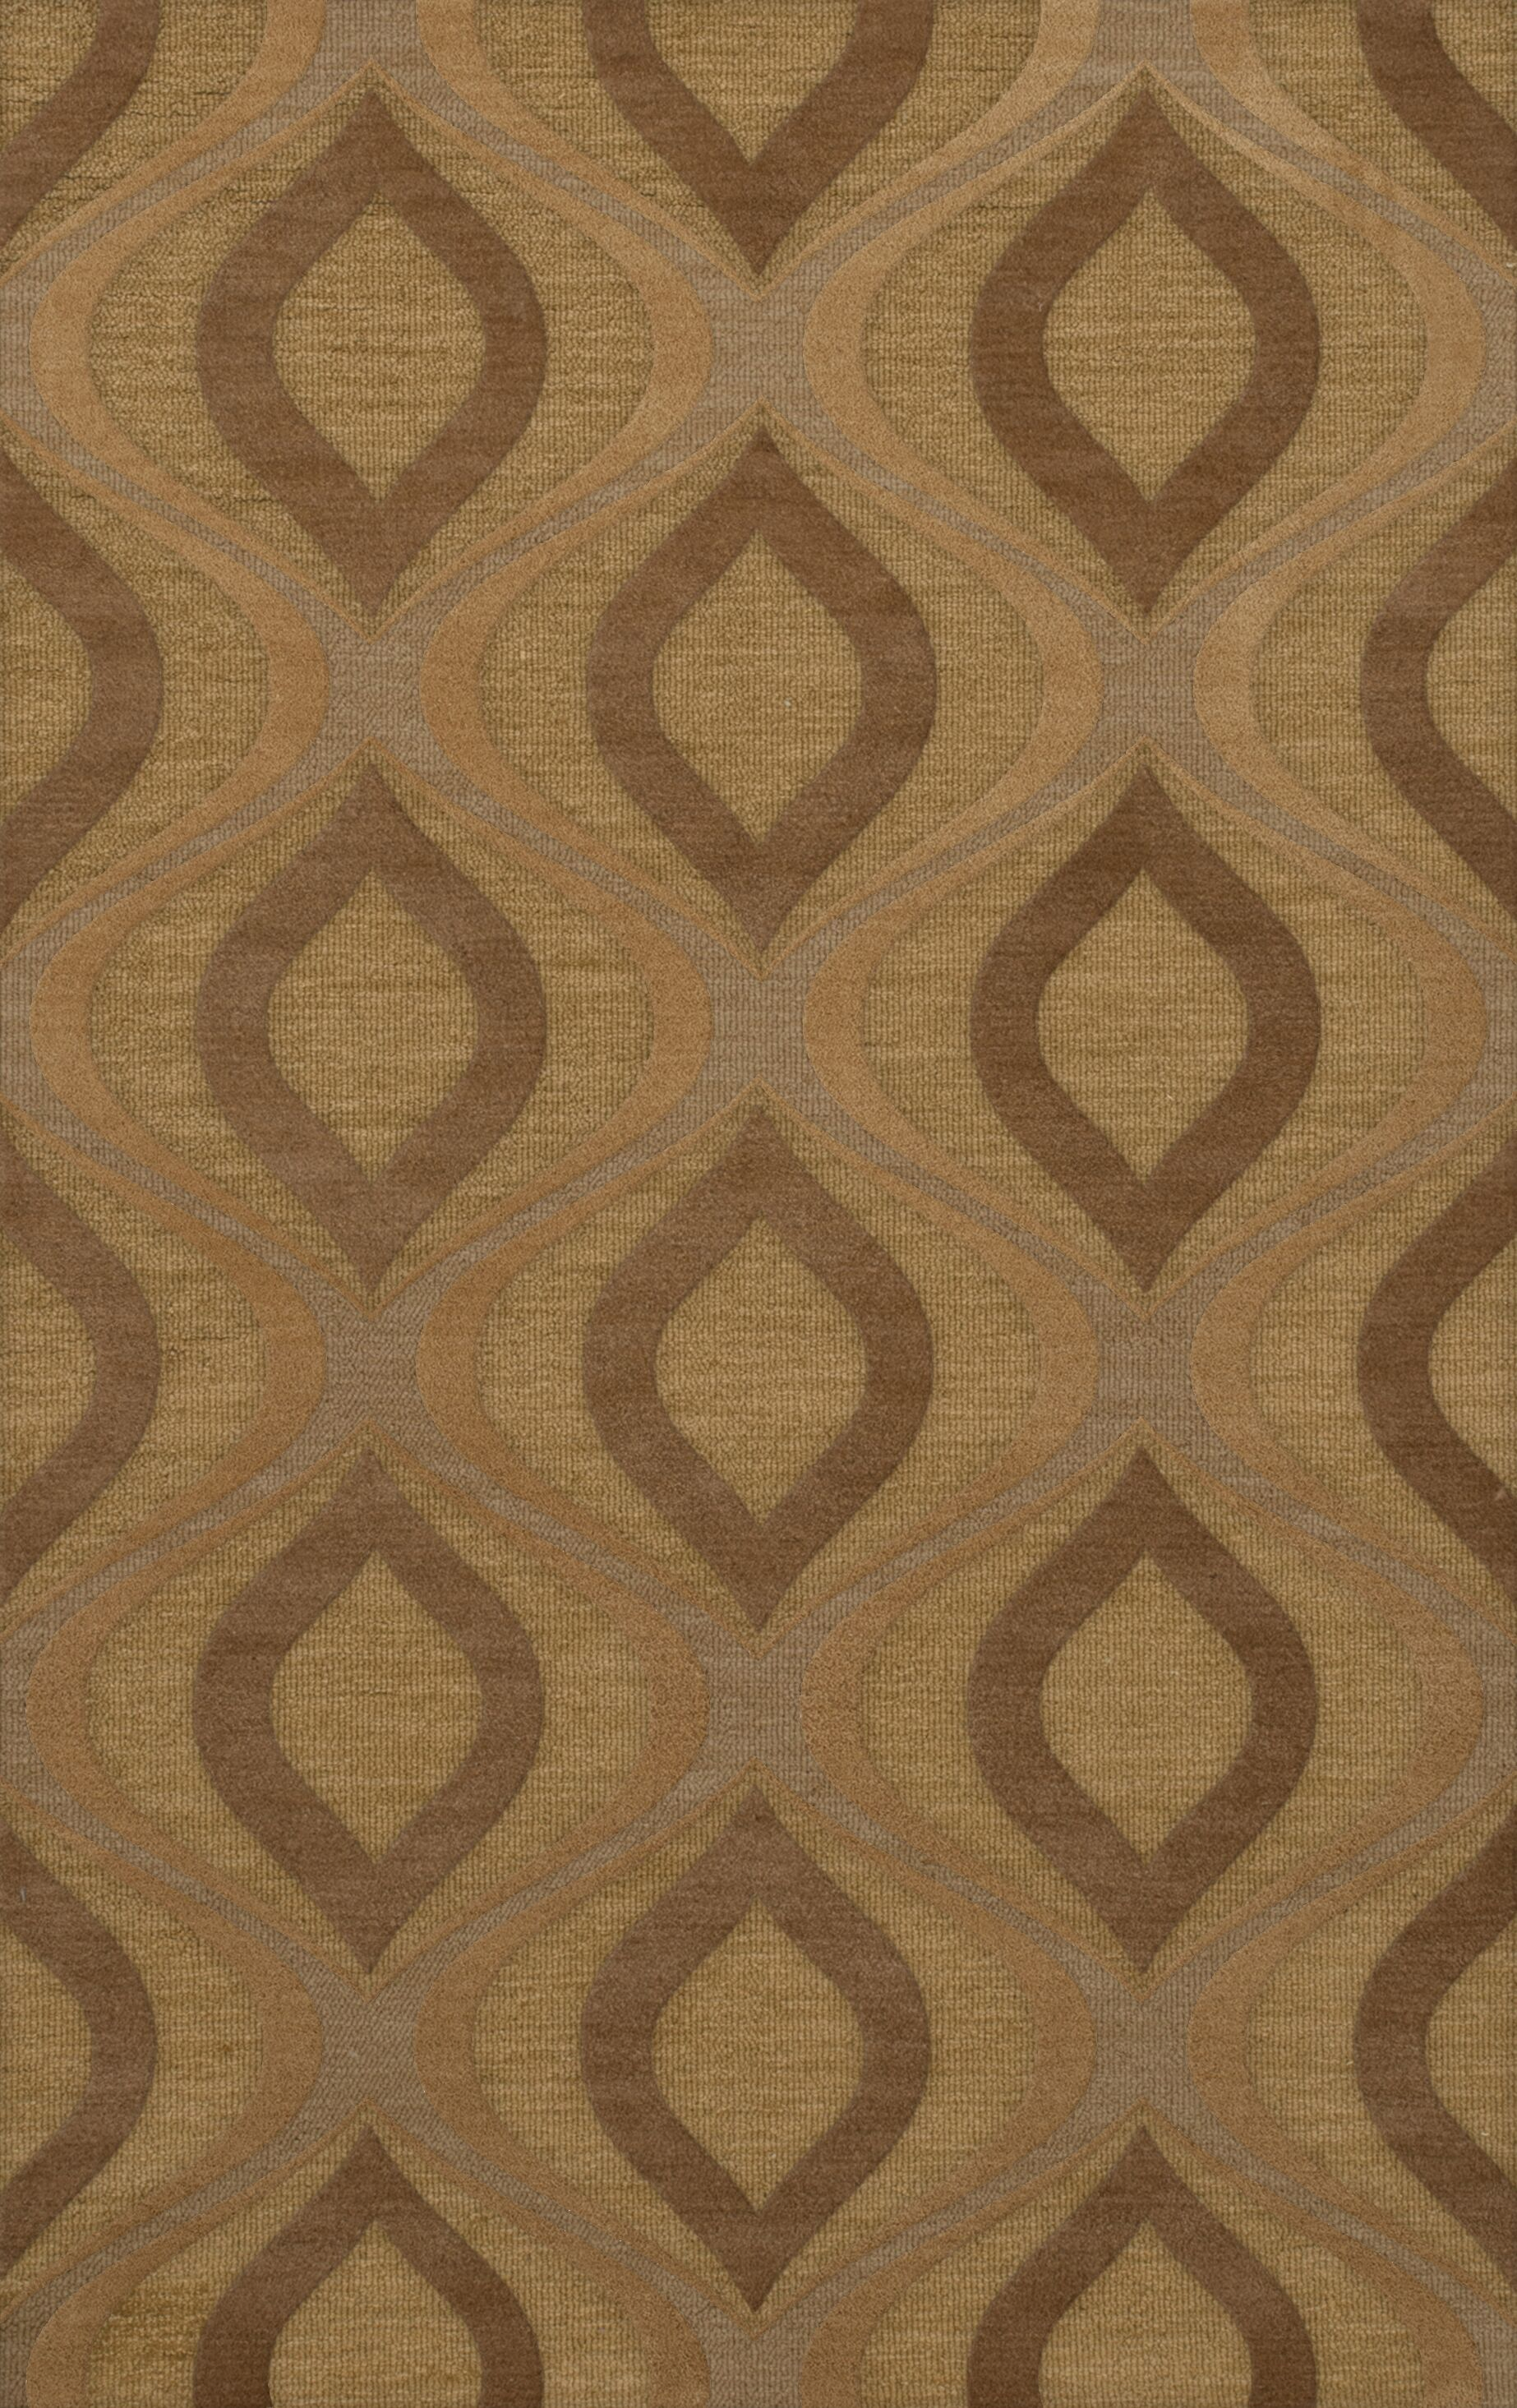 Sarahi Wool Amber Area Rug Rug Size: Rectangle 3' x 5'